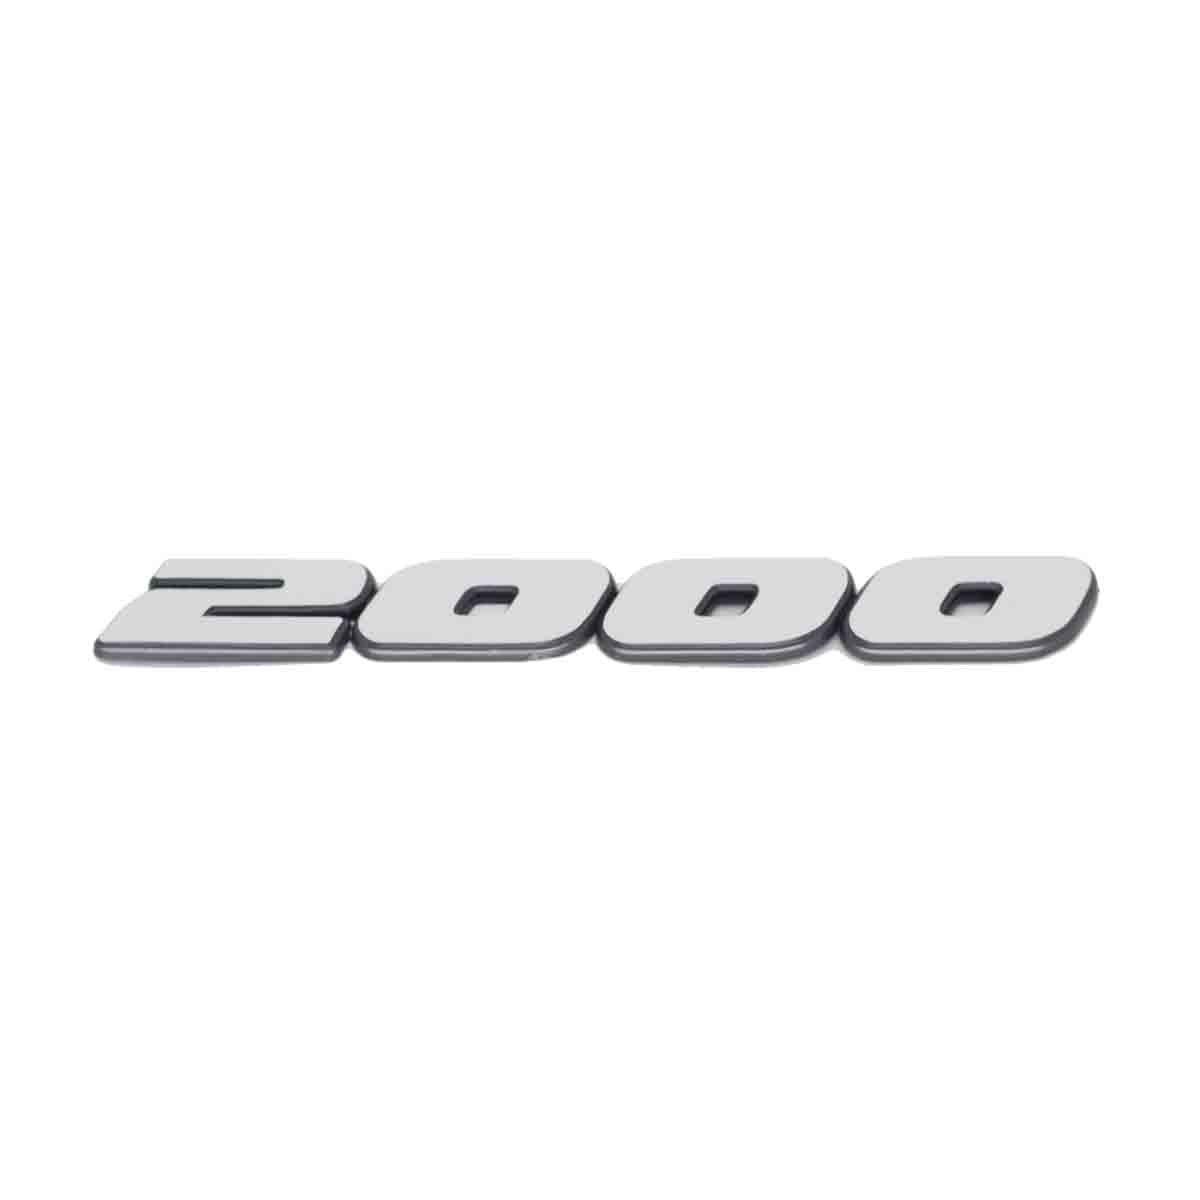 Emblema 2000 Santana 91/95